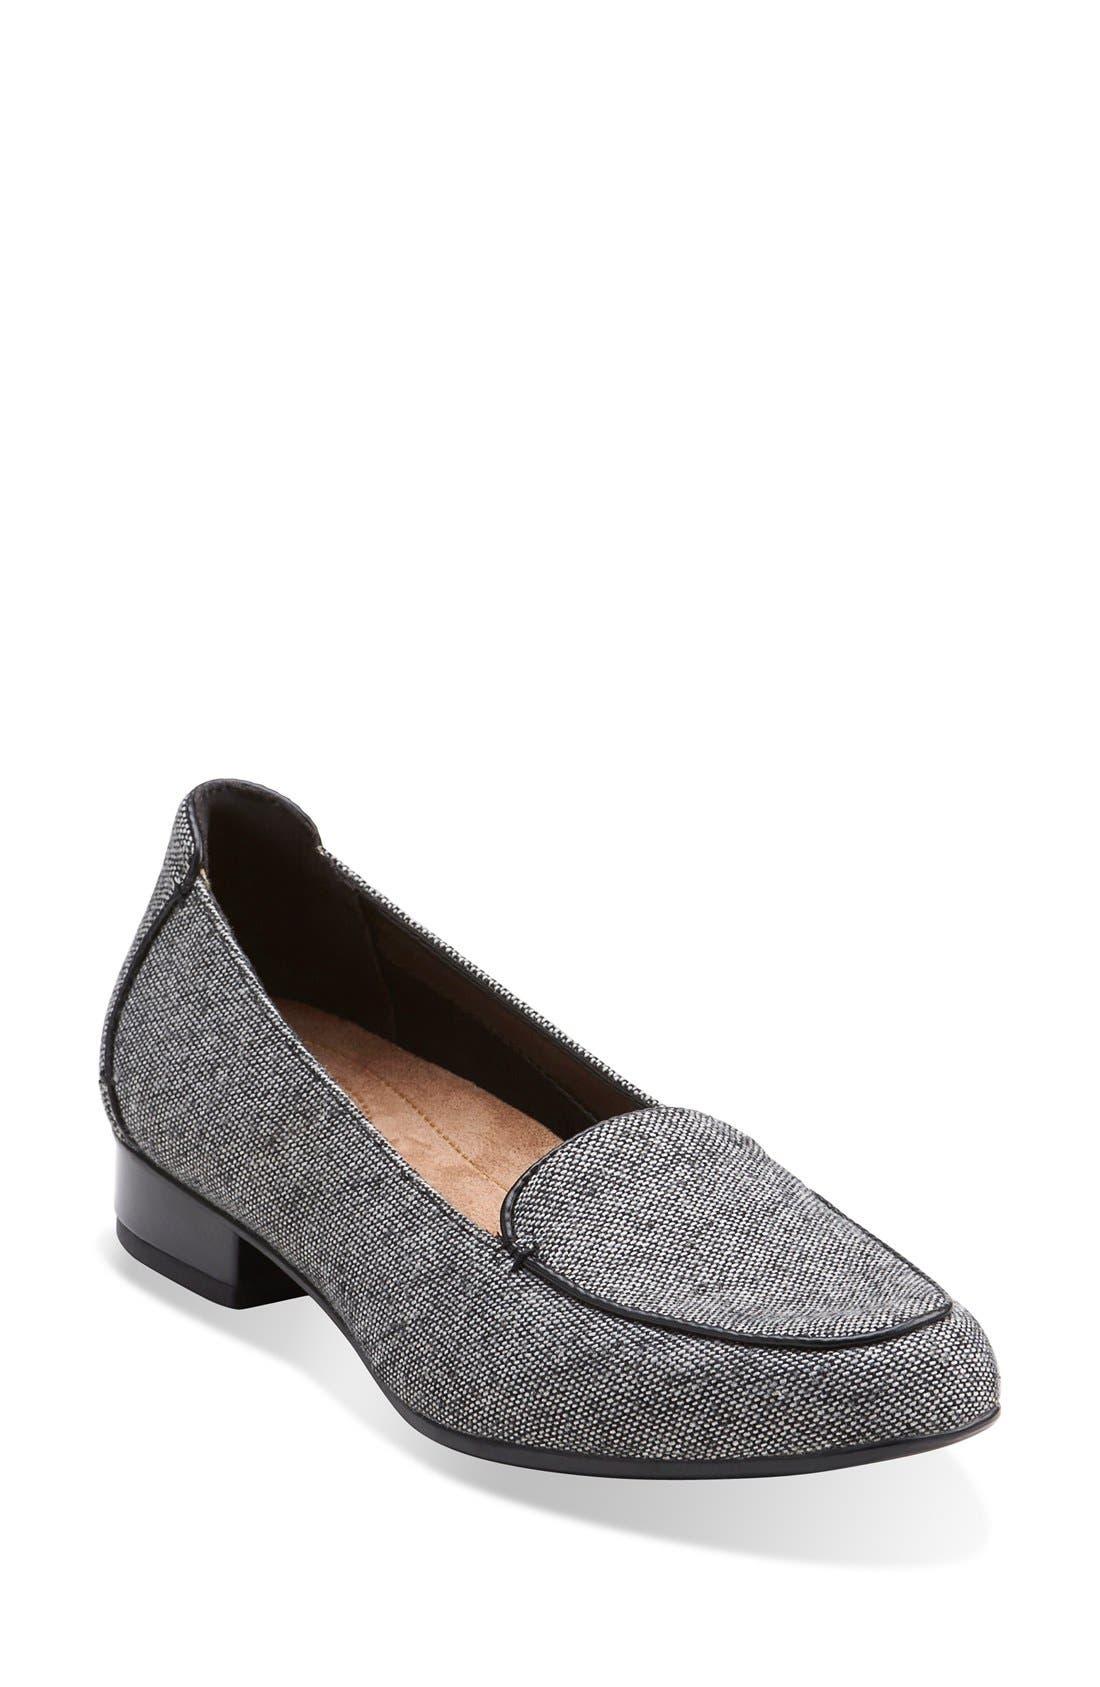 'KeeshaLuca' Loafer,                             Main thumbnail 1, color,                             Grey Tweed